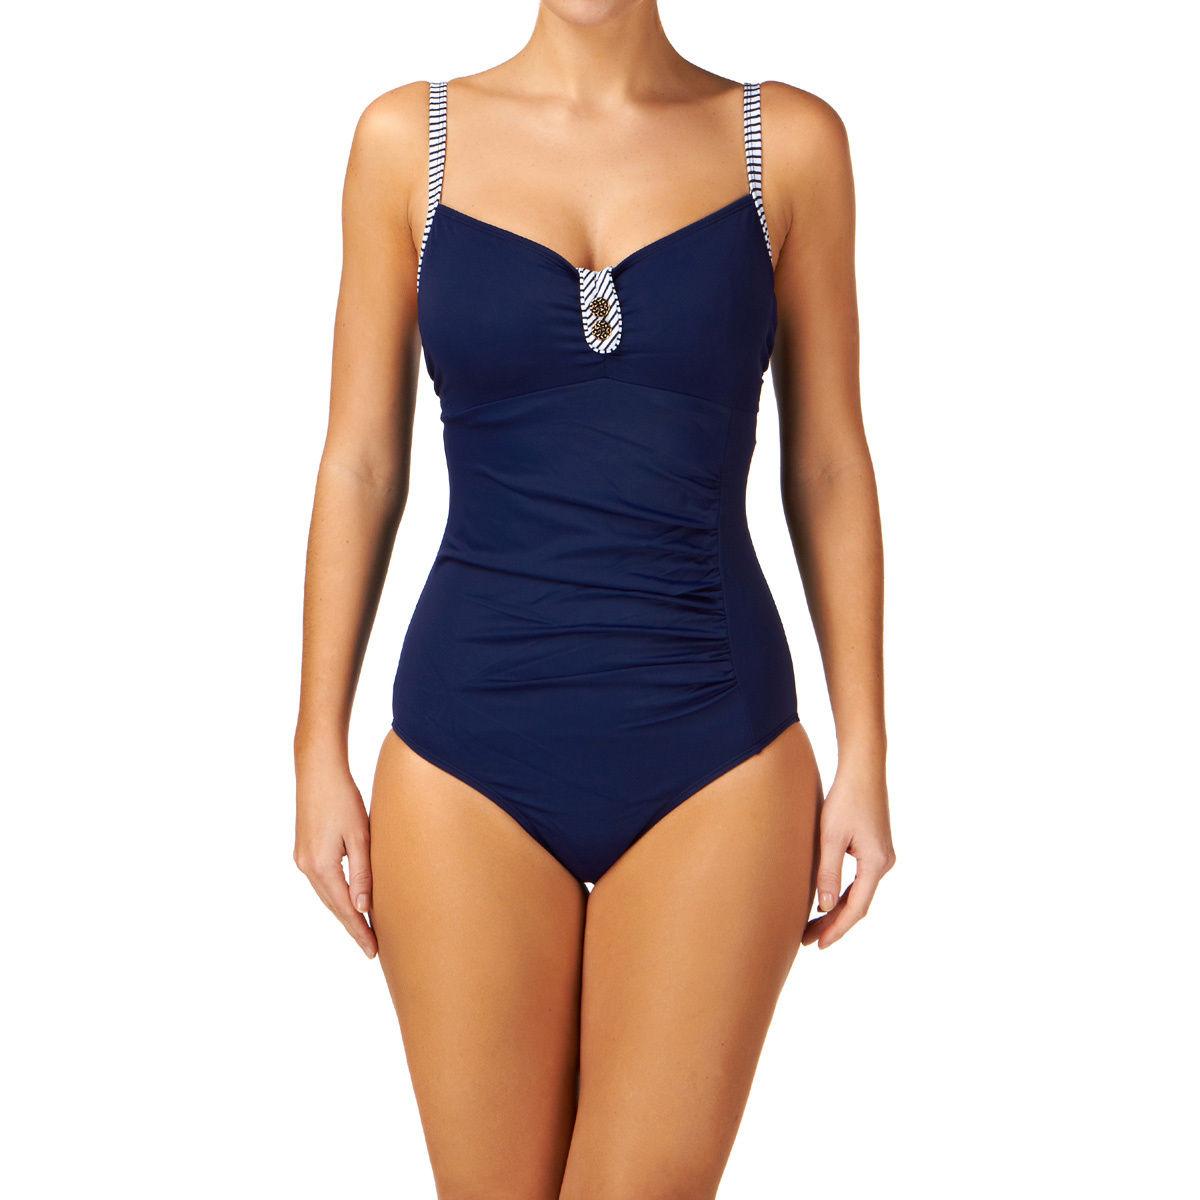 Panache Veronica Swimsuit